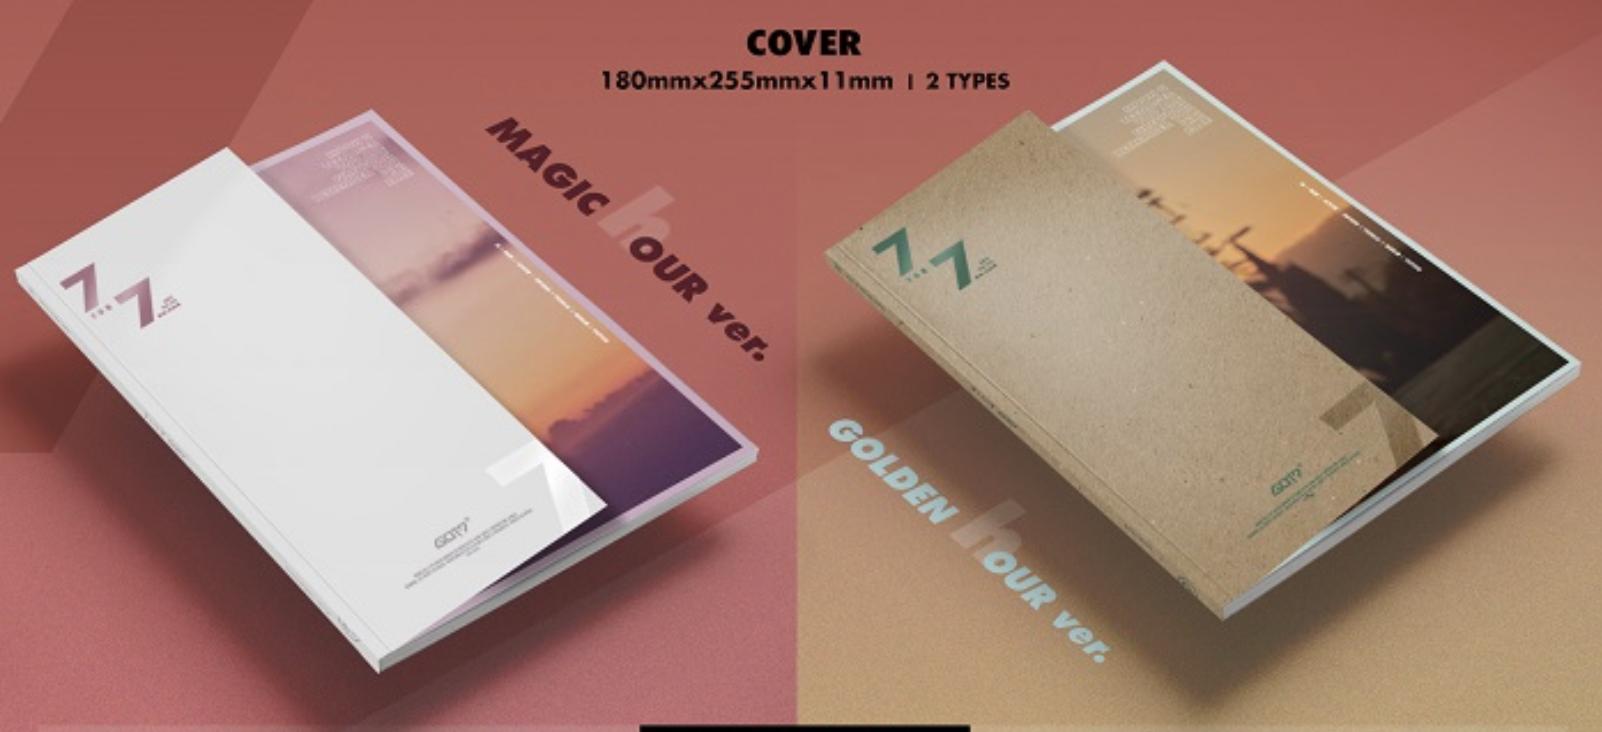 GOT7 - Album [7 for 7] หน้าปกสุ่ม